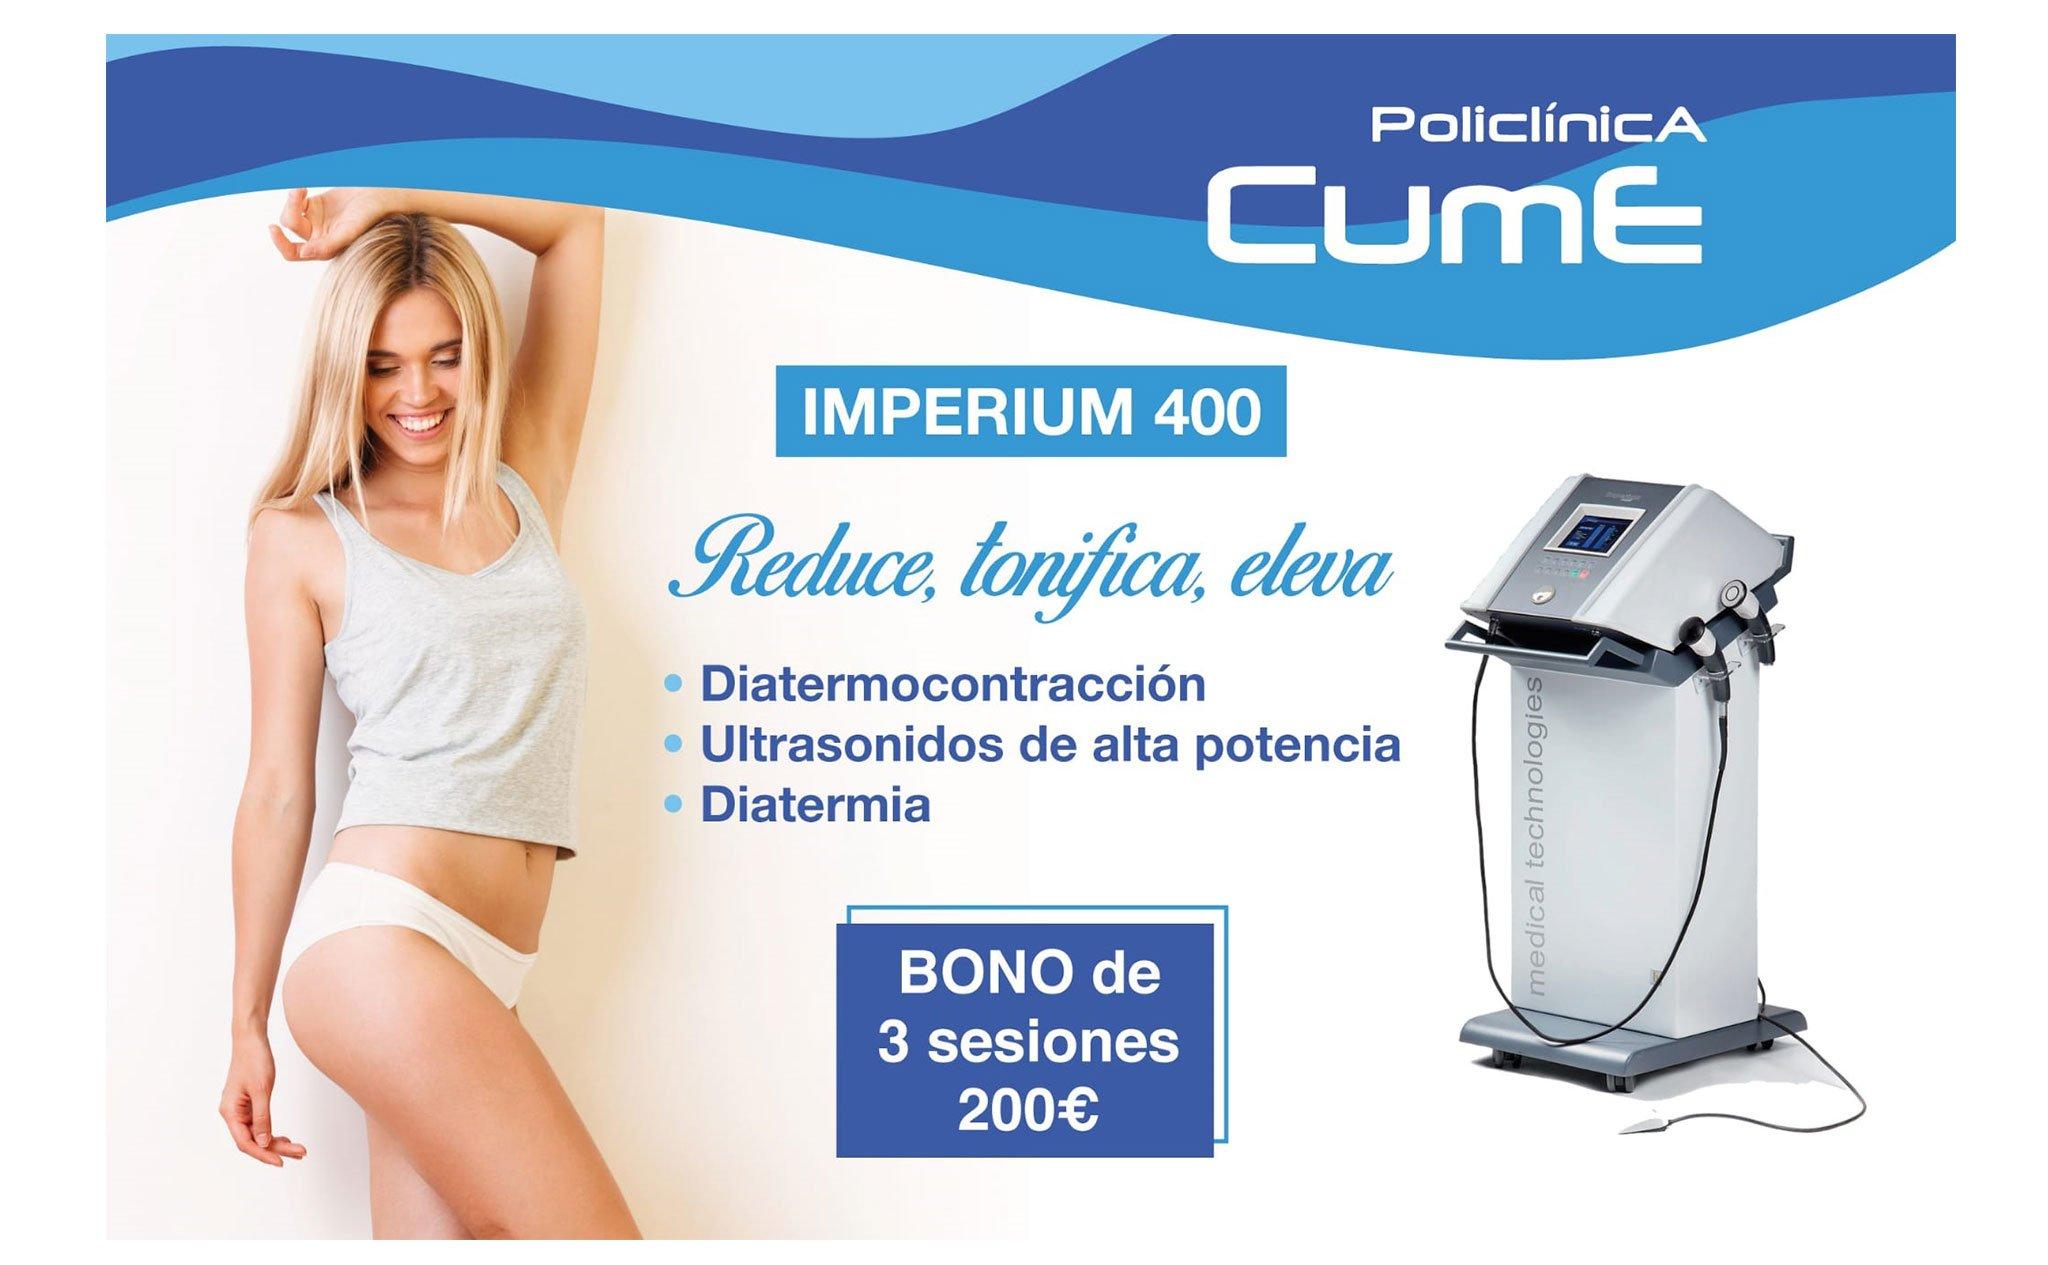 Tratamiento Imperium 400 – Policlínica CUME